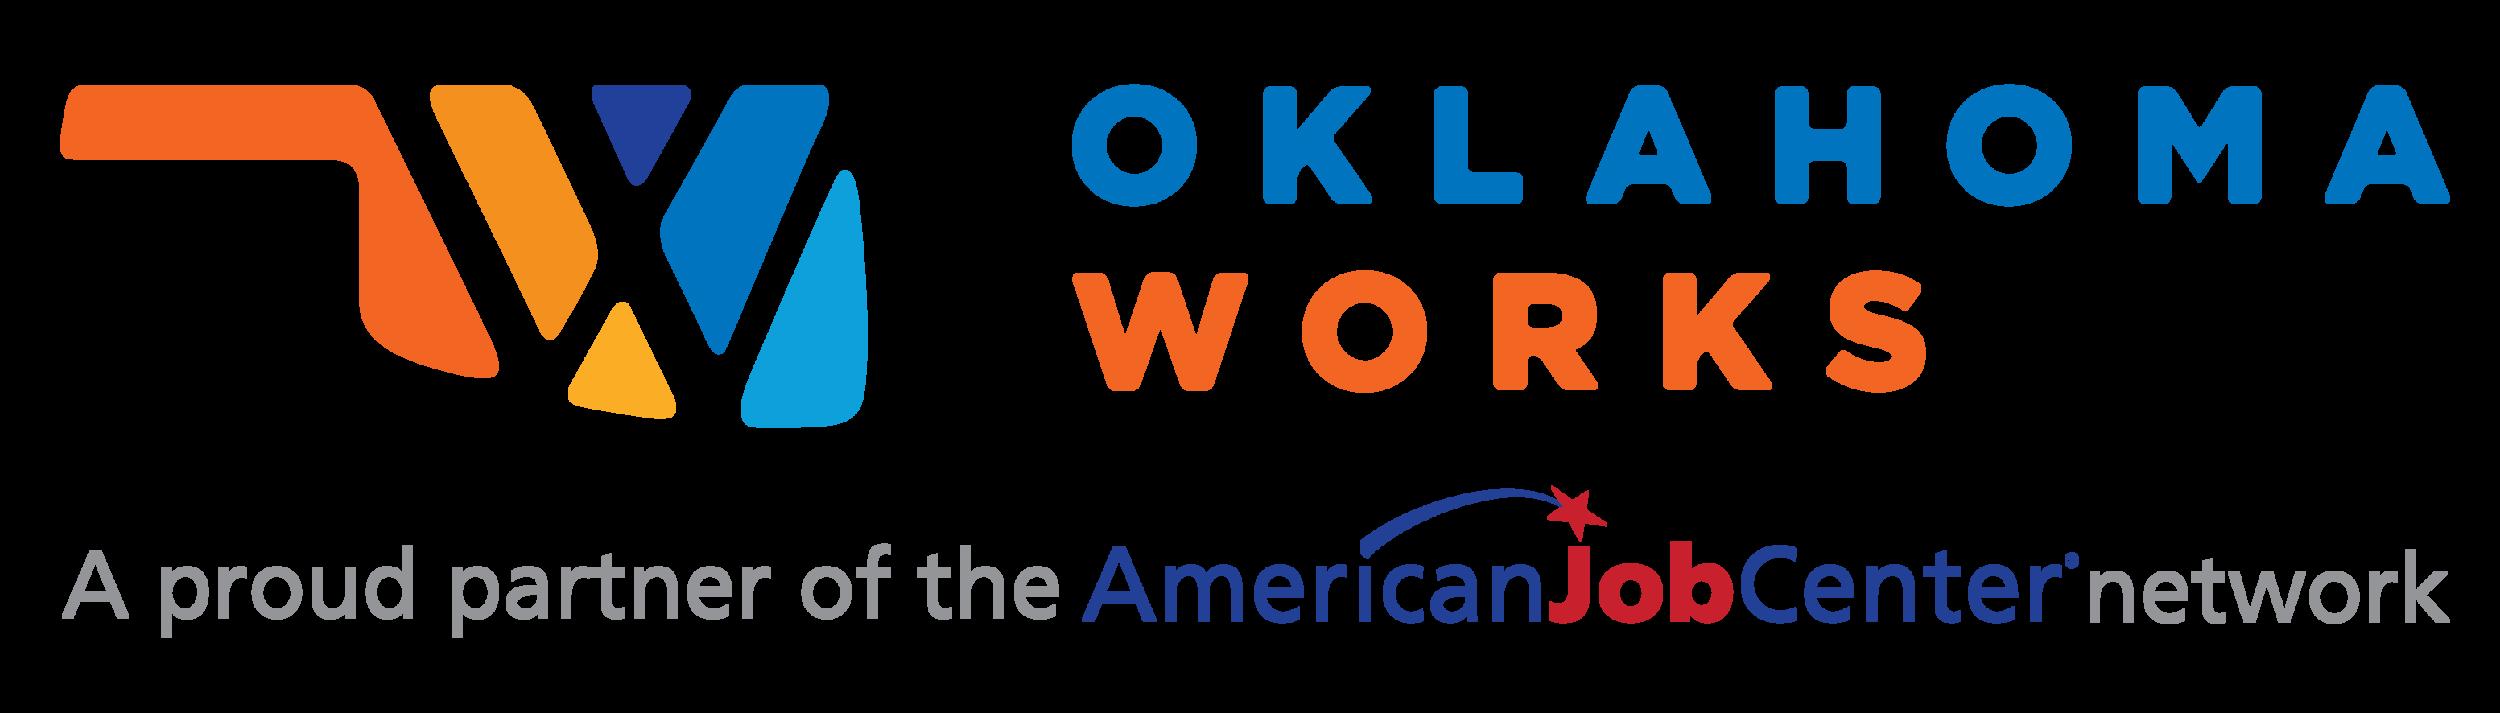 R_oklahoma-works-logo-horizontal-cmyk-01.png